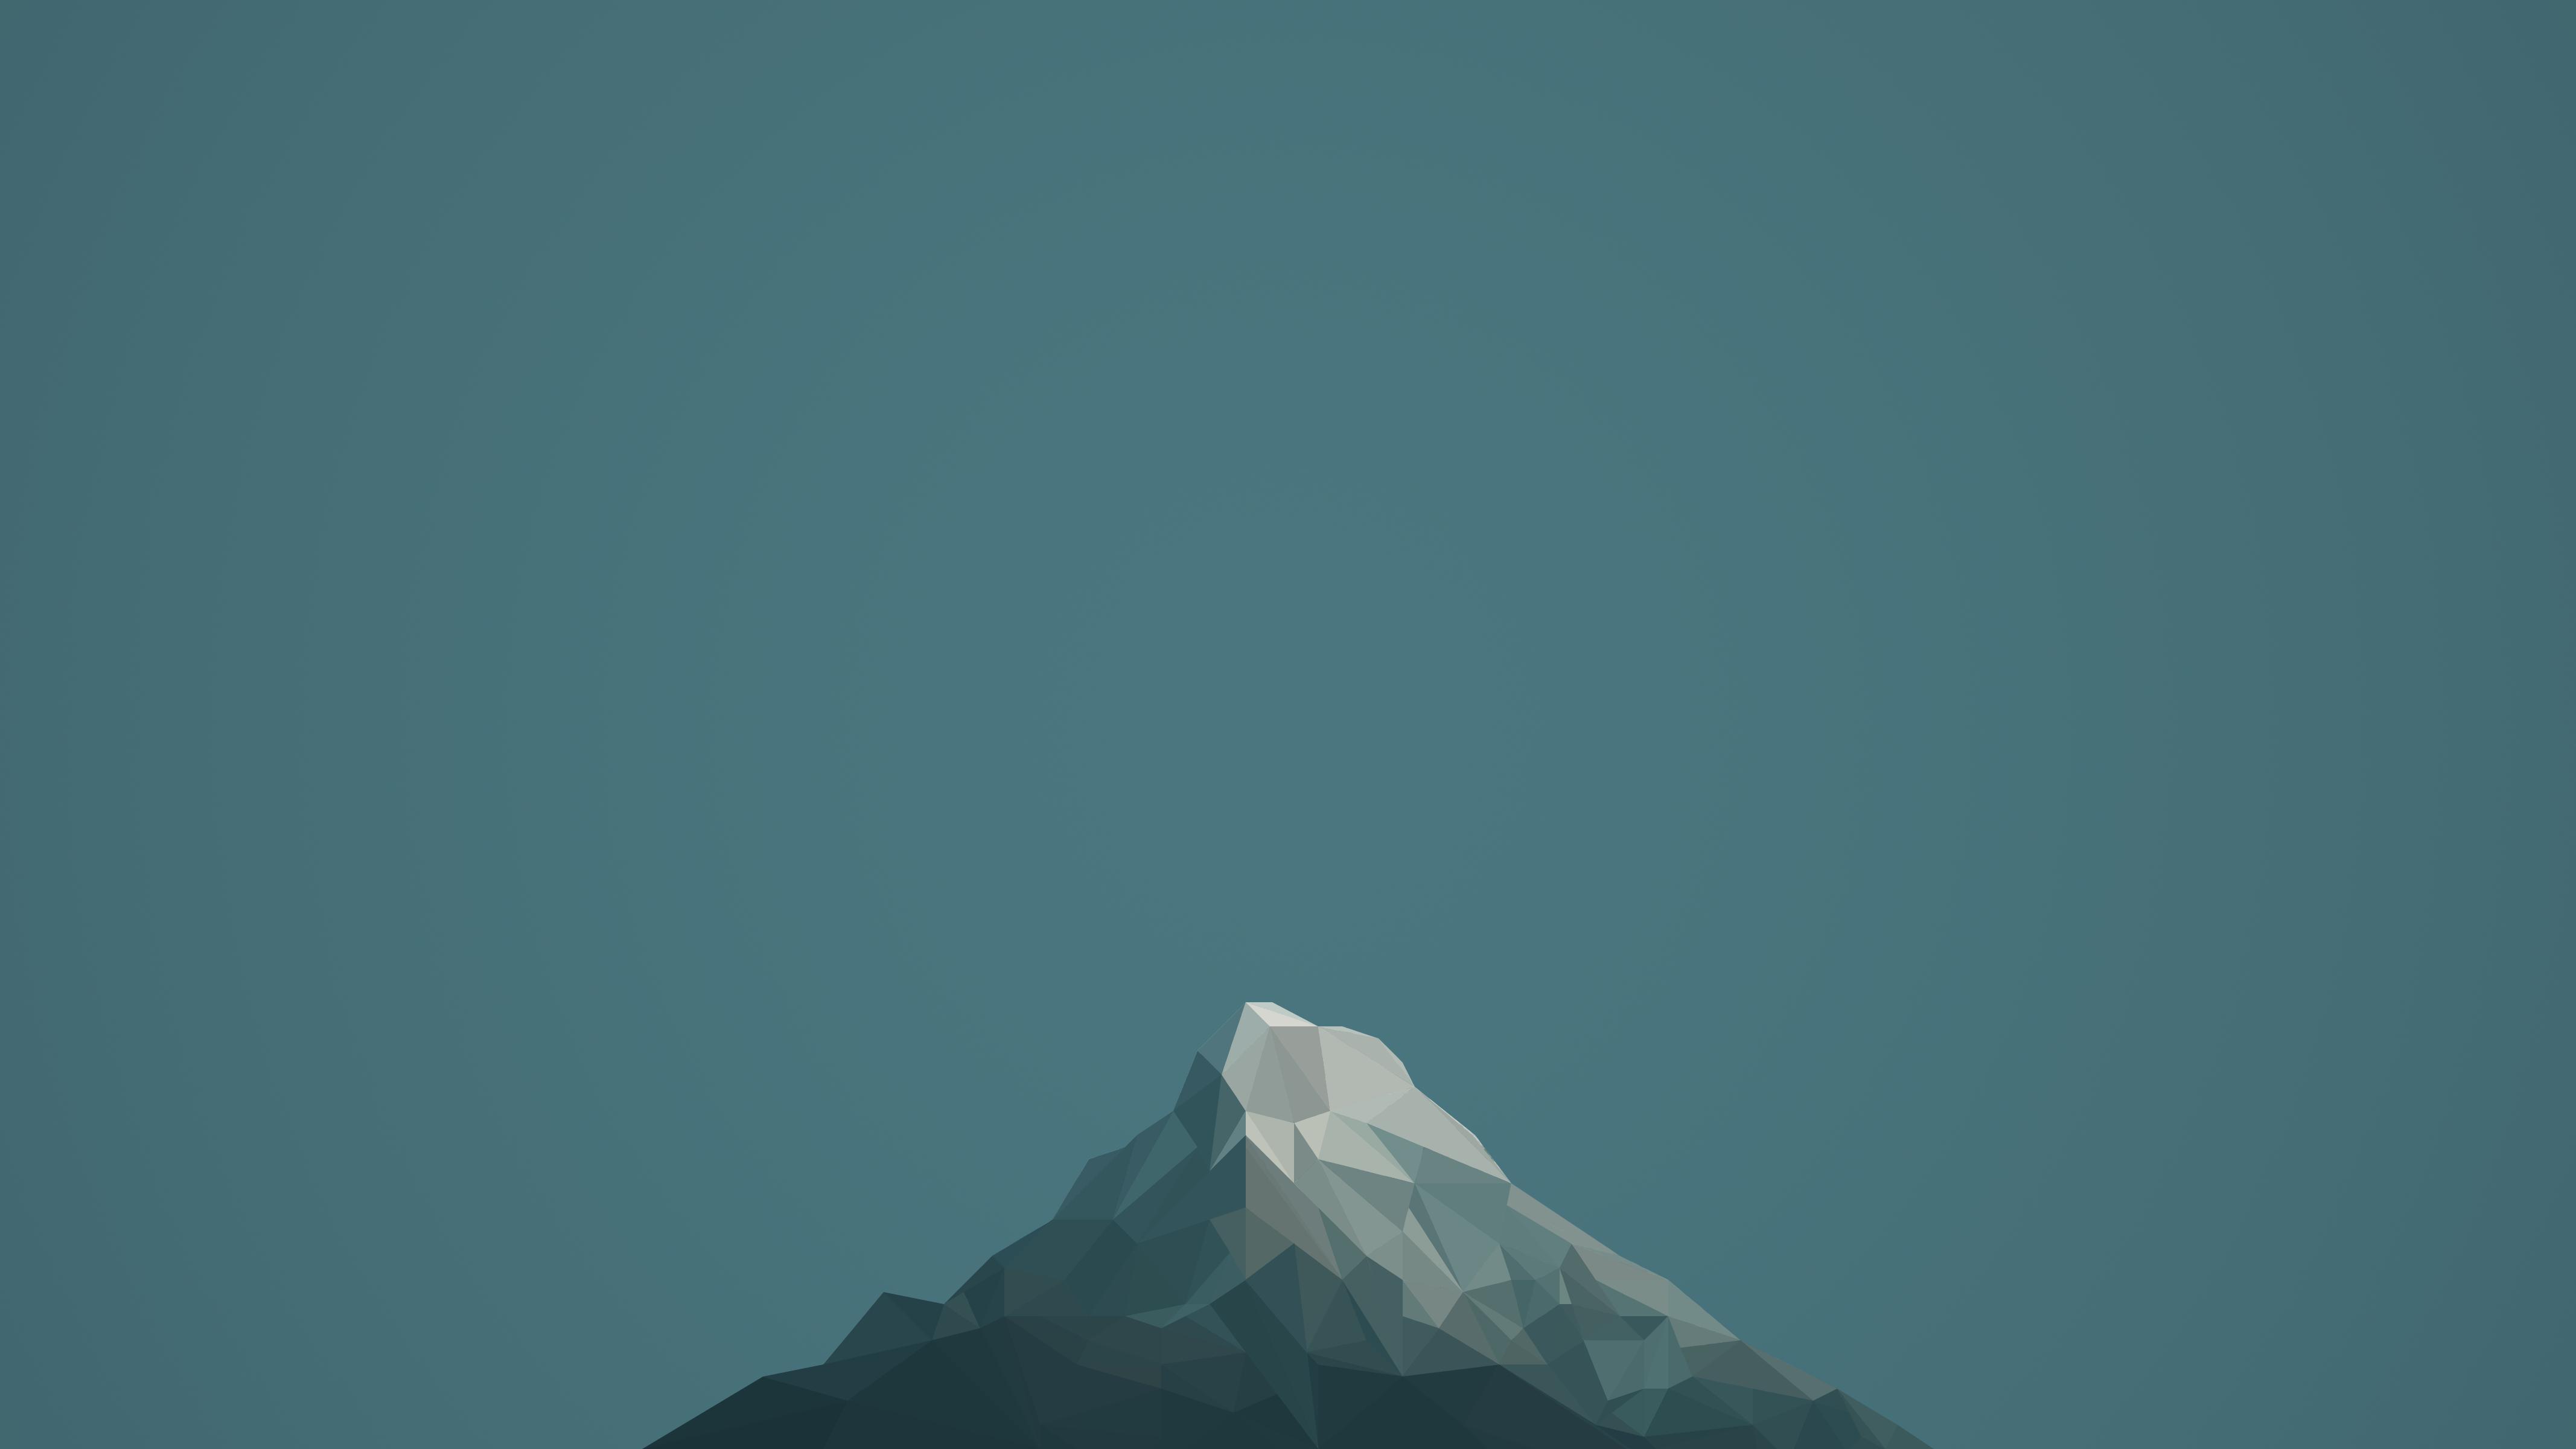 Minimalism Mountain Peak Full Hd Wallpaper: Top Free Minimalist Backgrounds